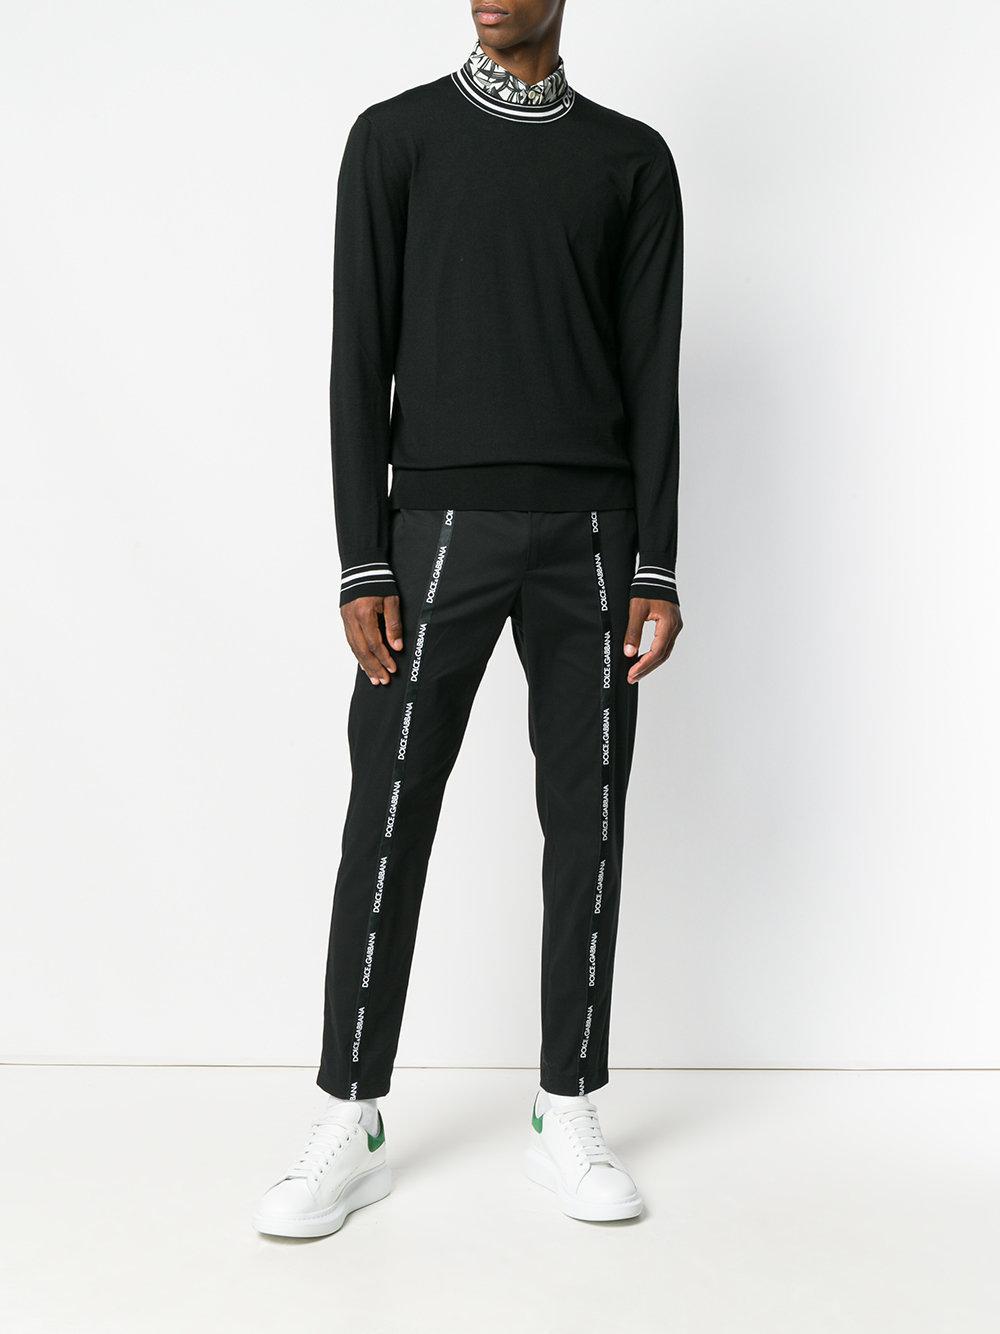 Dolce & Gabbana Cotton Logo Strap Trousers in Black for Men